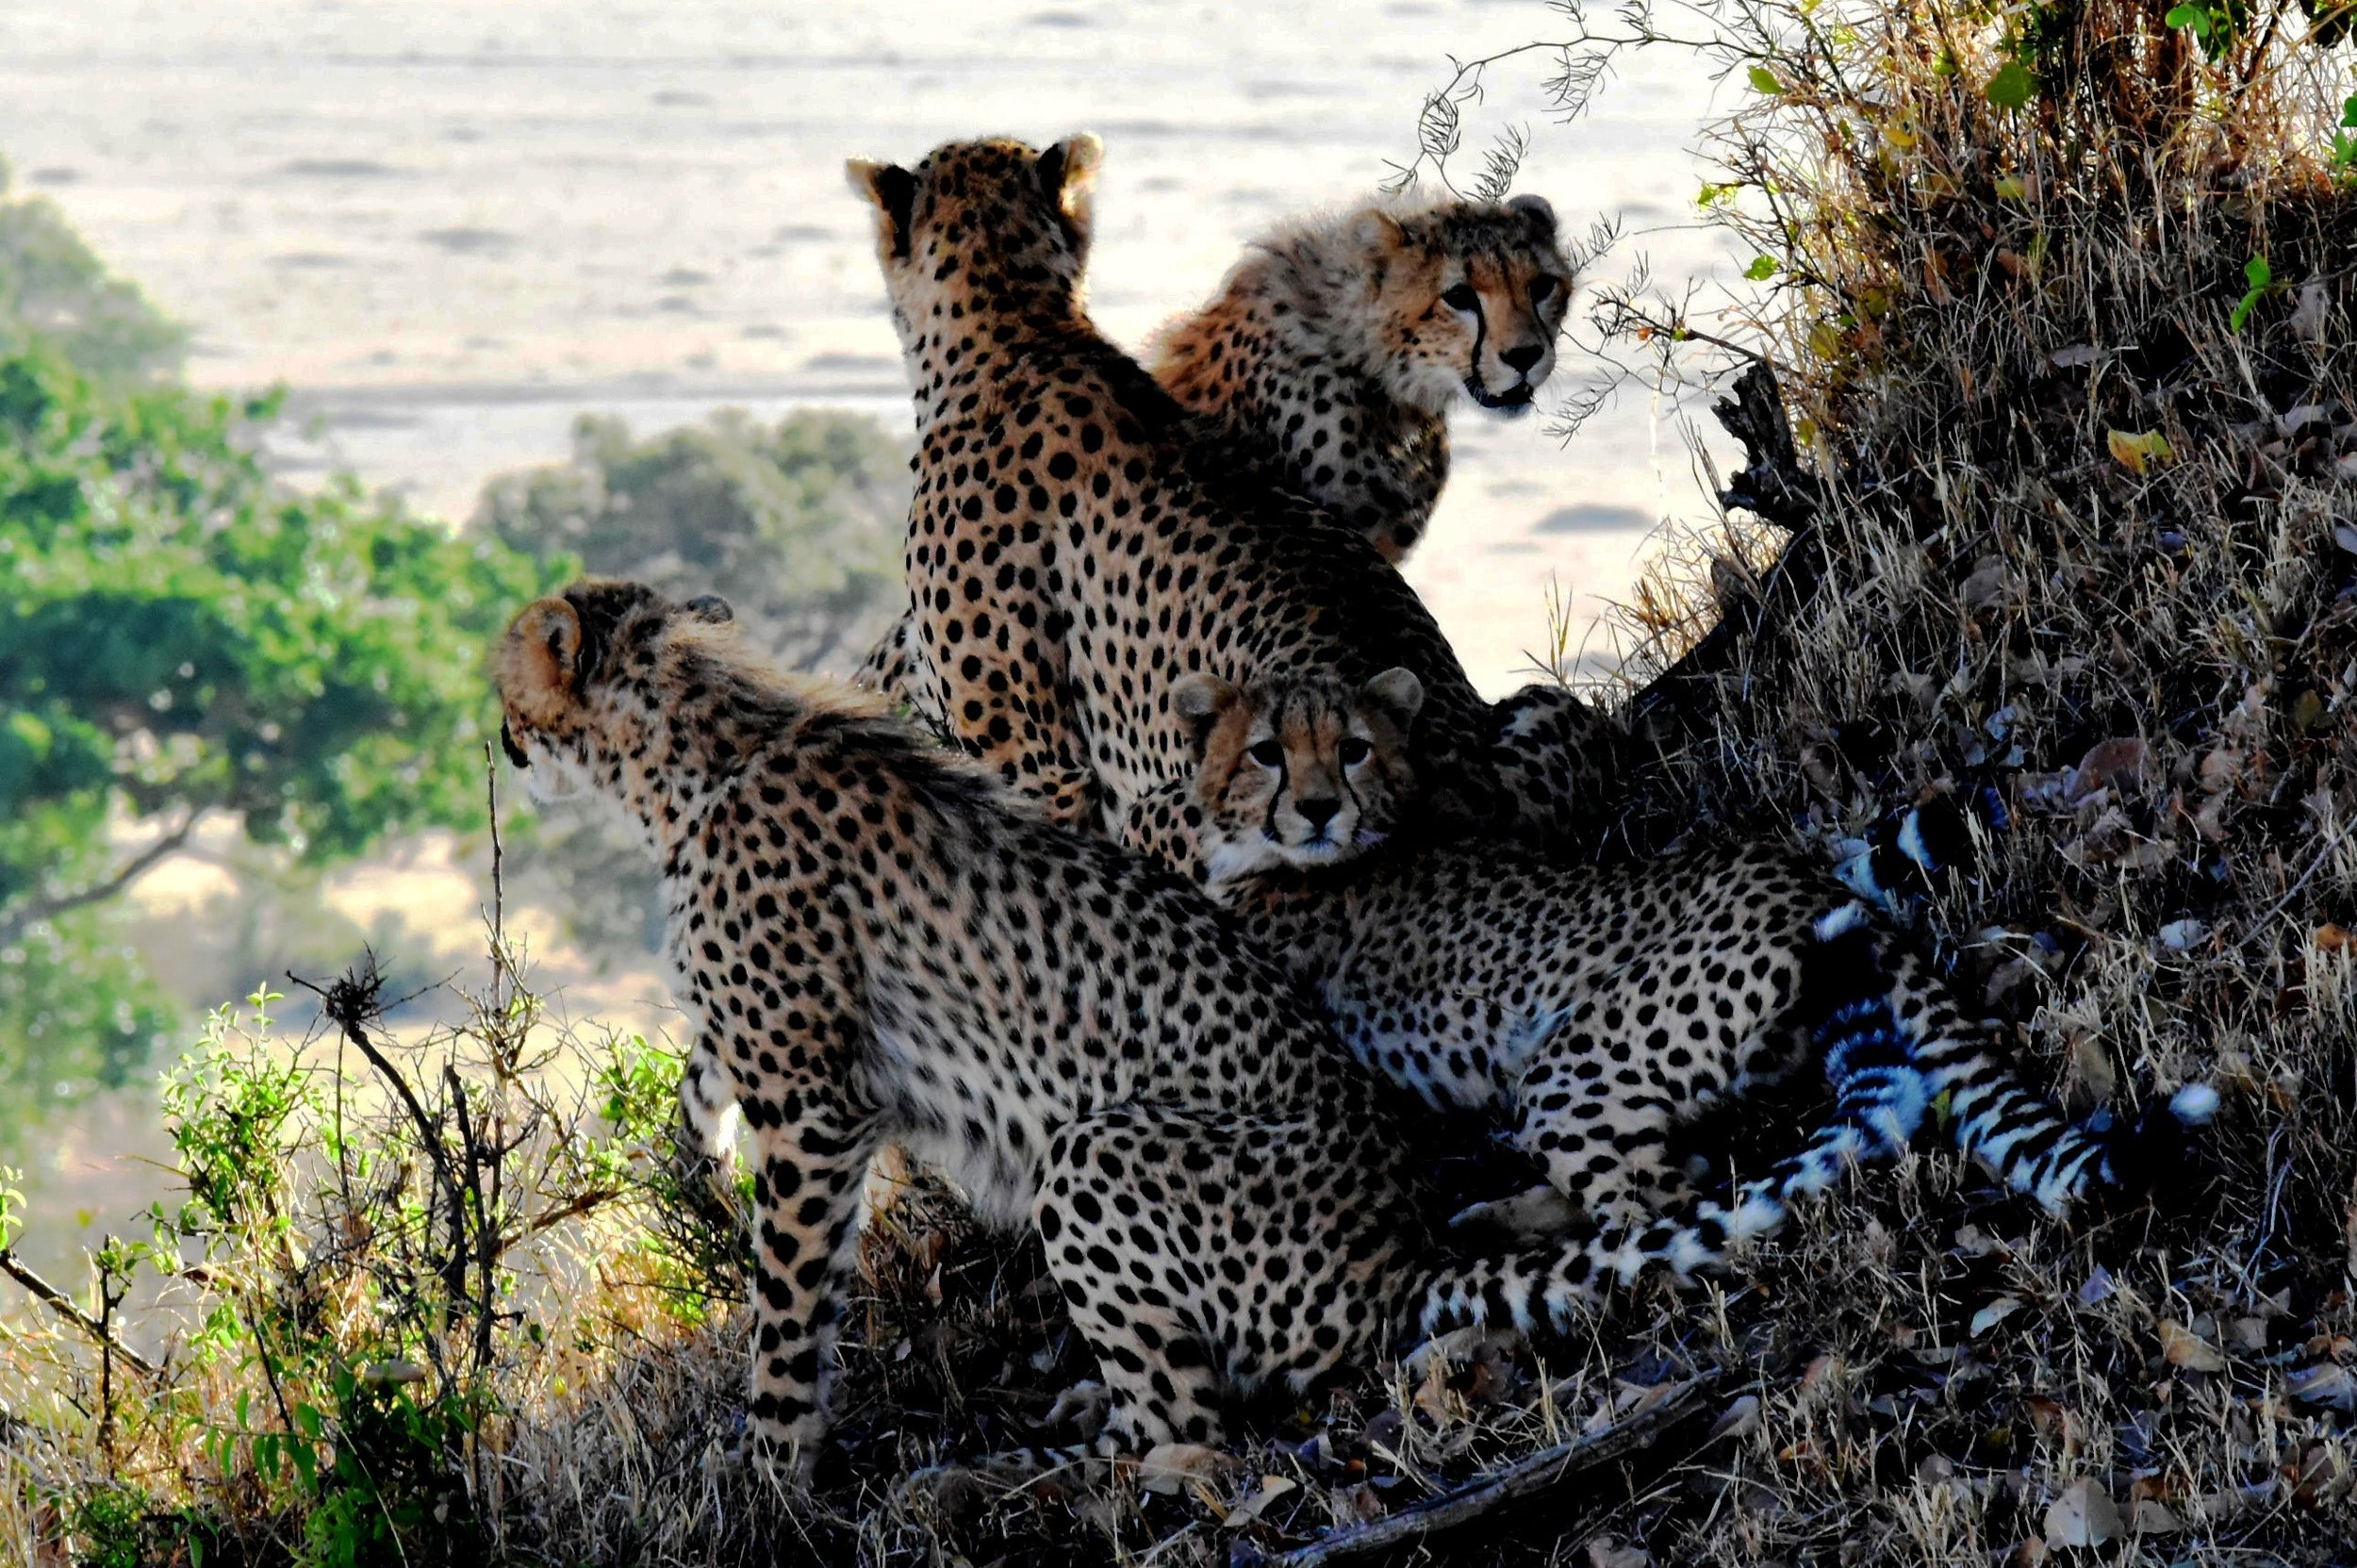 africa-animal-animal-photography-160459.jpg